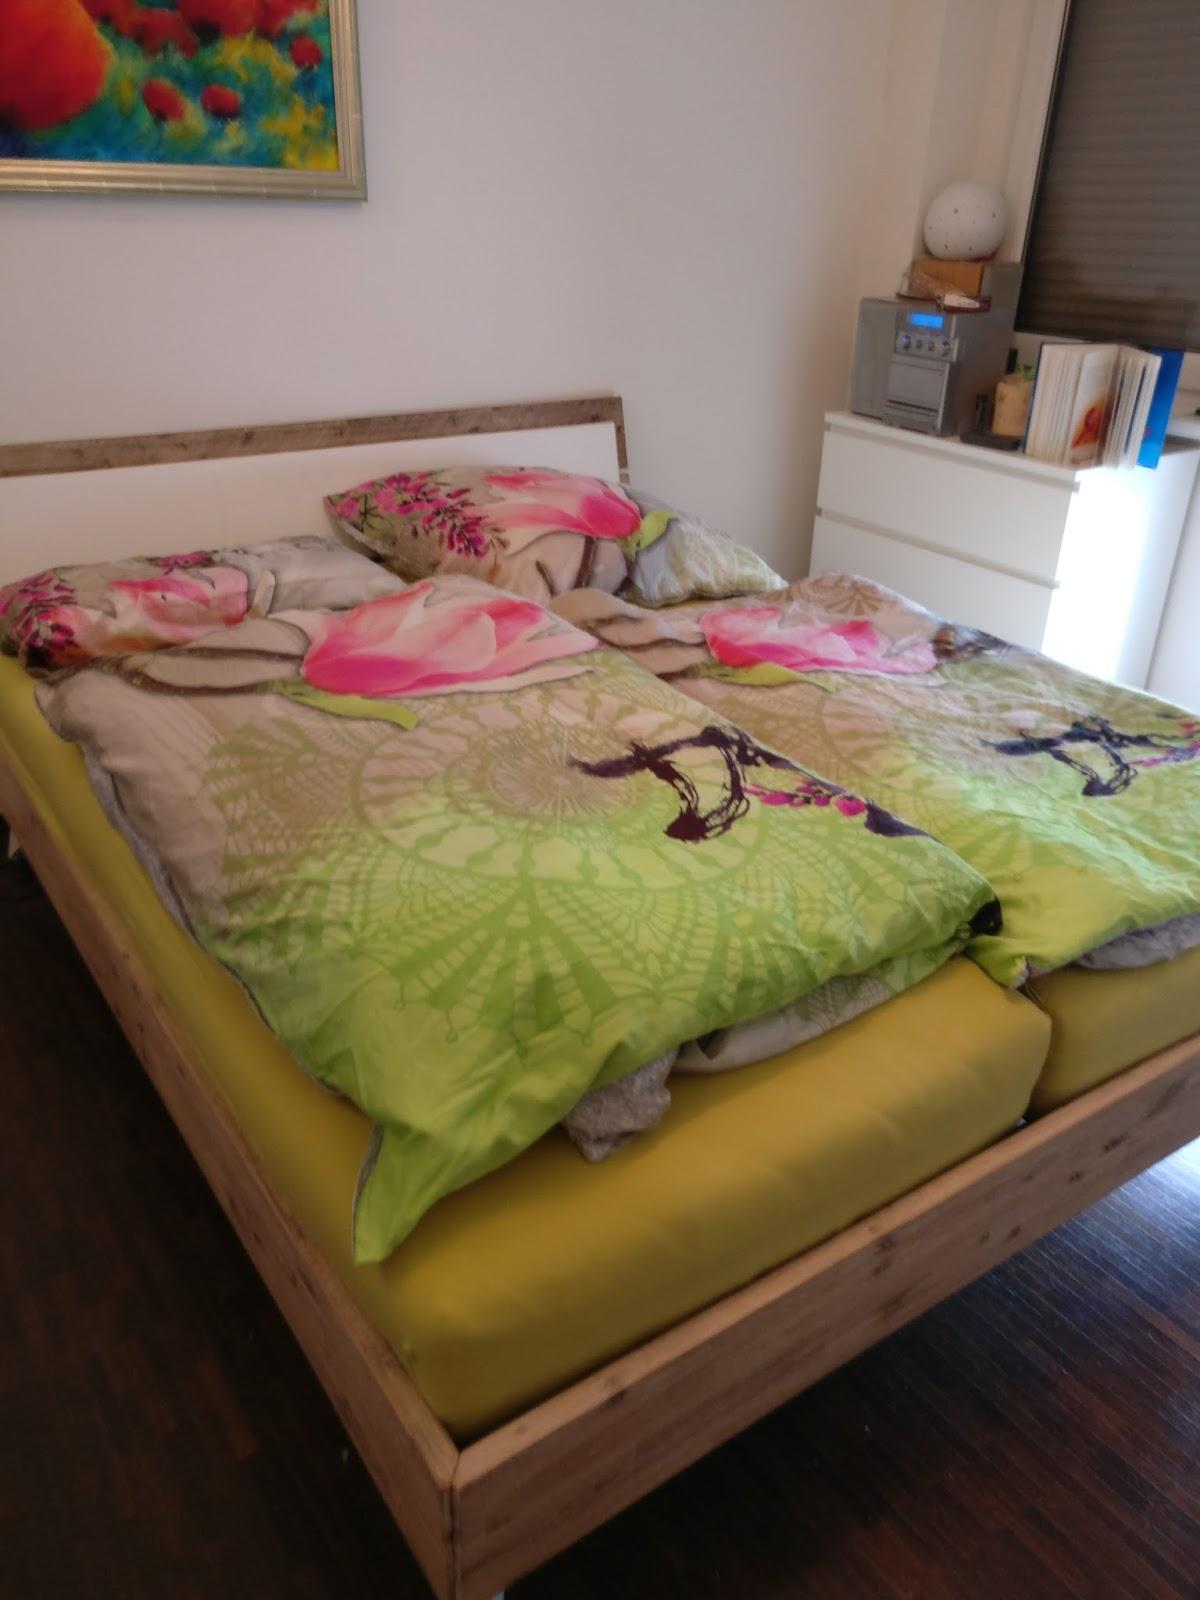 lady crooks sophisticated irgendwie habe ich wieder lust. Black Bedroom Furniture Sets. Home Design Ideas